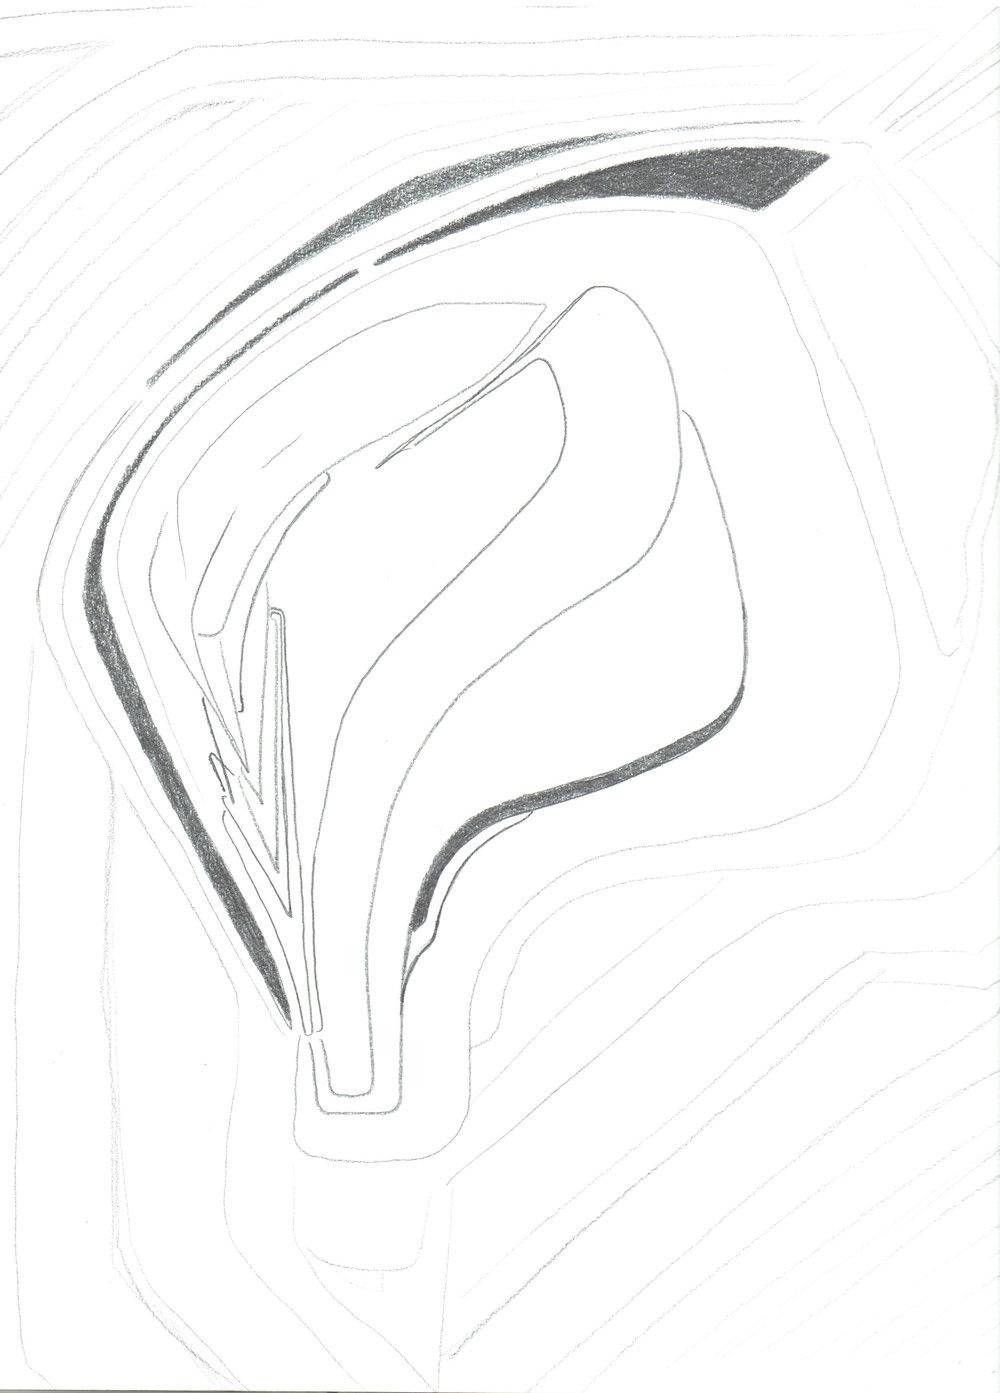 Abstract 01.jpeg